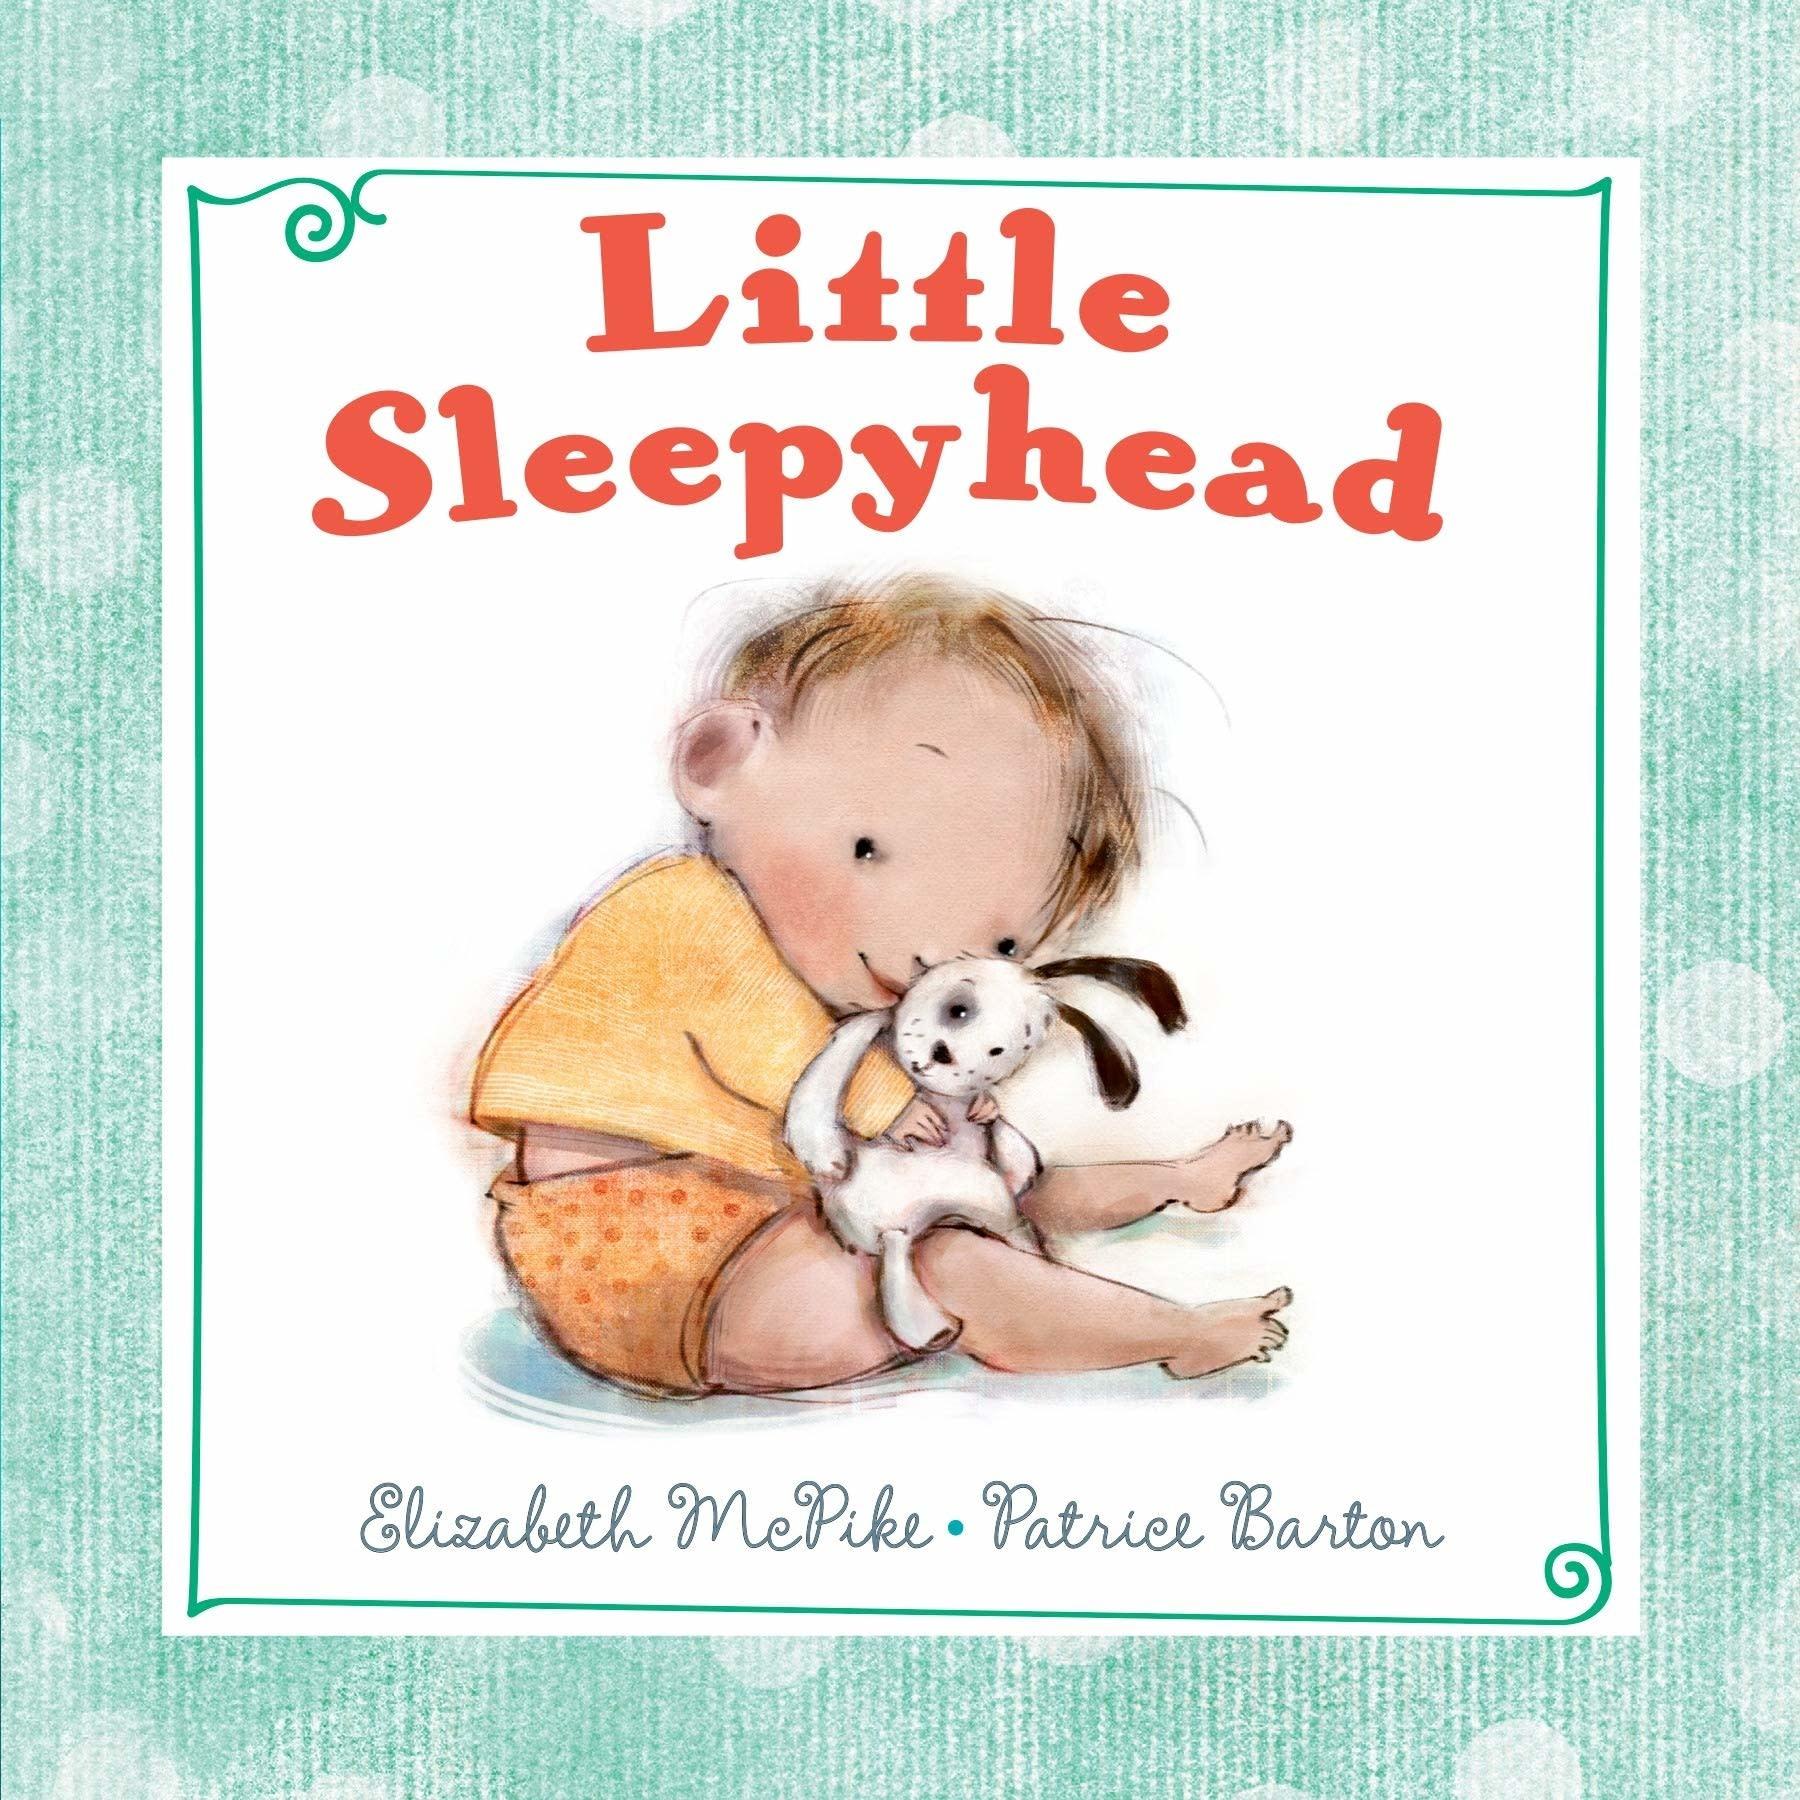 Penguin Random House (here) littleSleepyhead